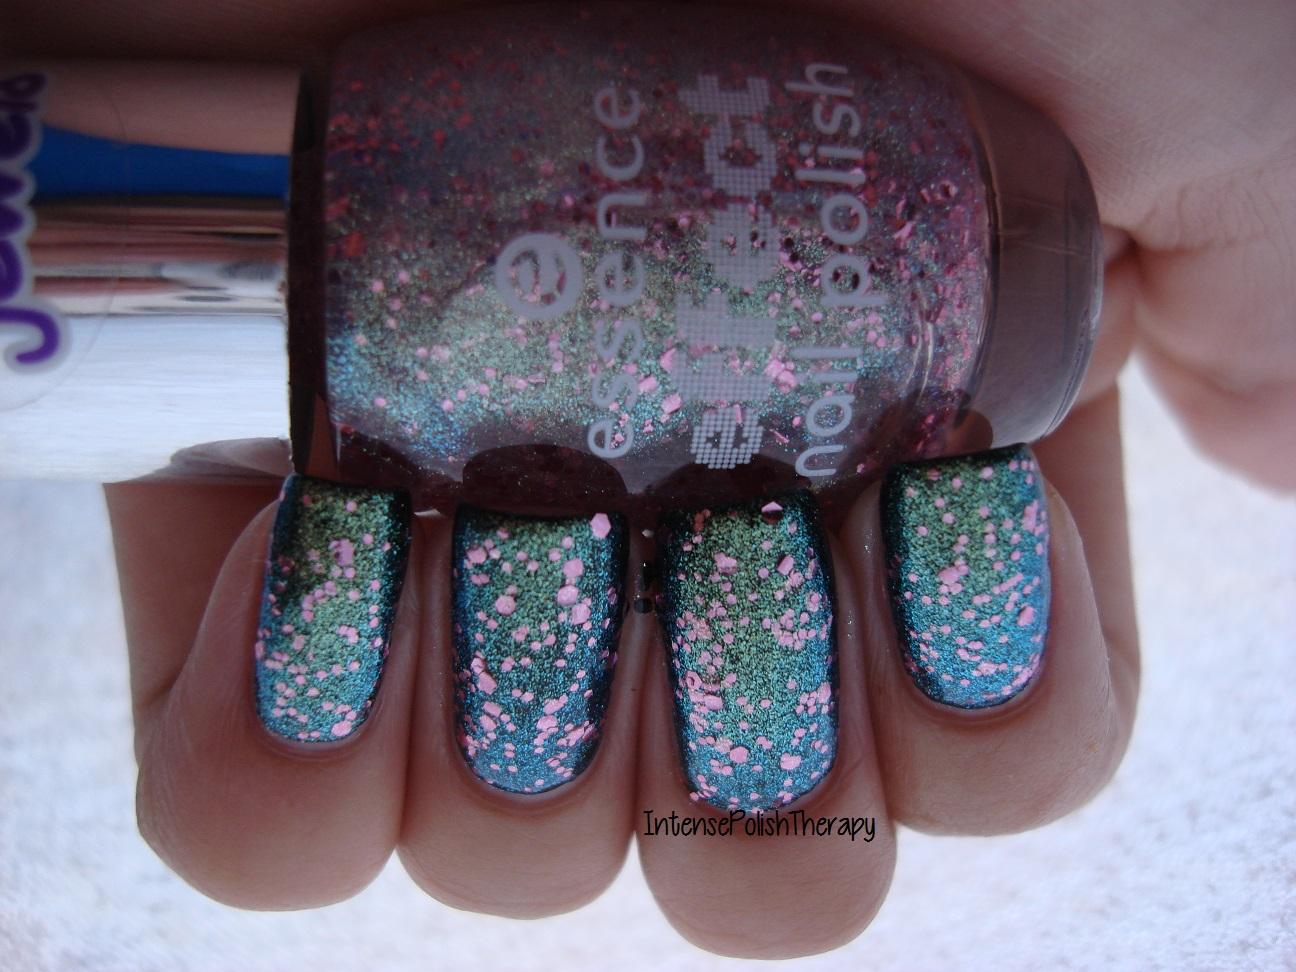 Essence - Glitz & Glam